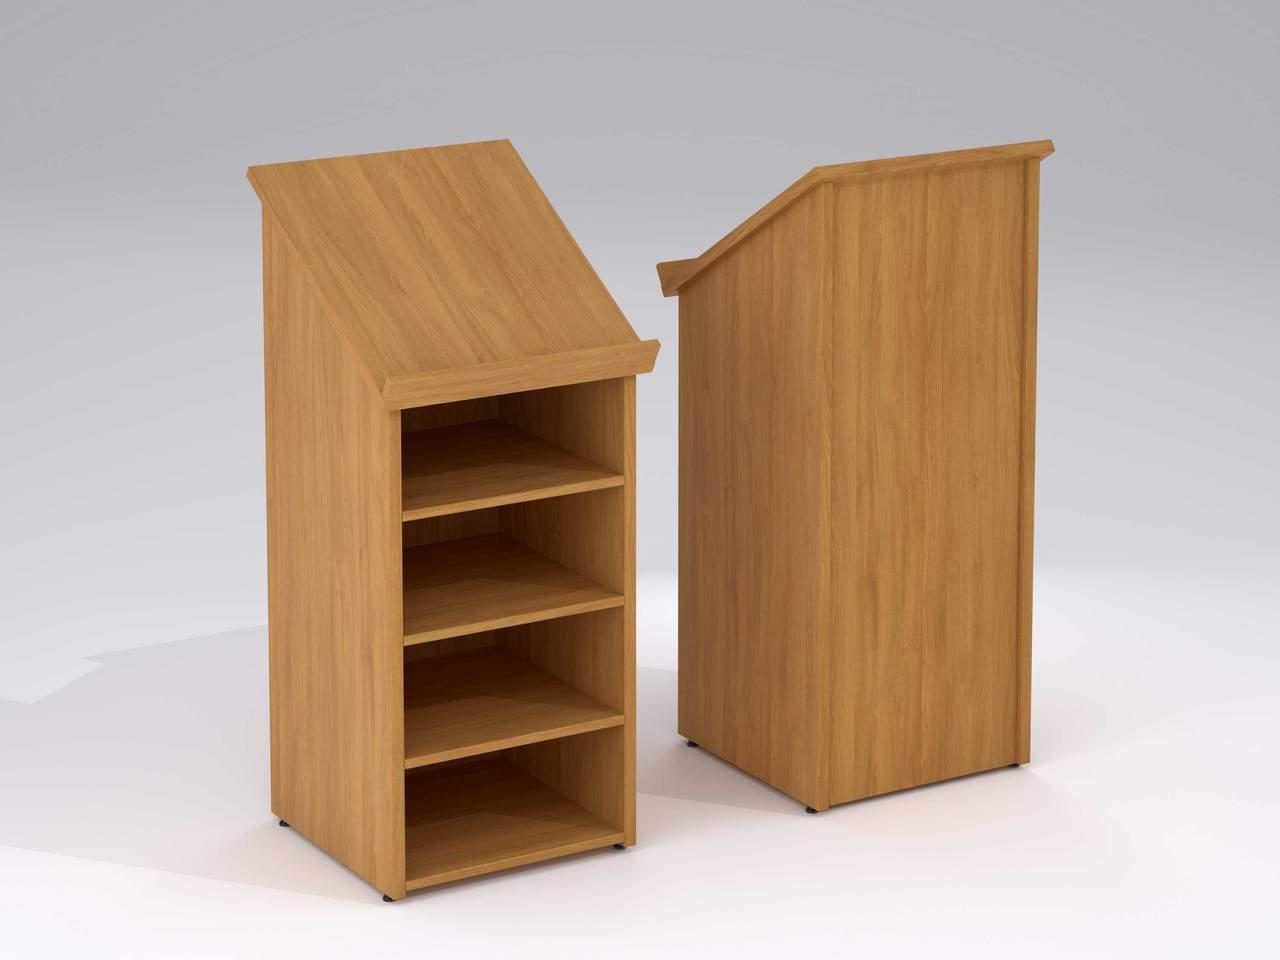 TCS nTree Presentation Podium Lectern with Open Shelving Storage